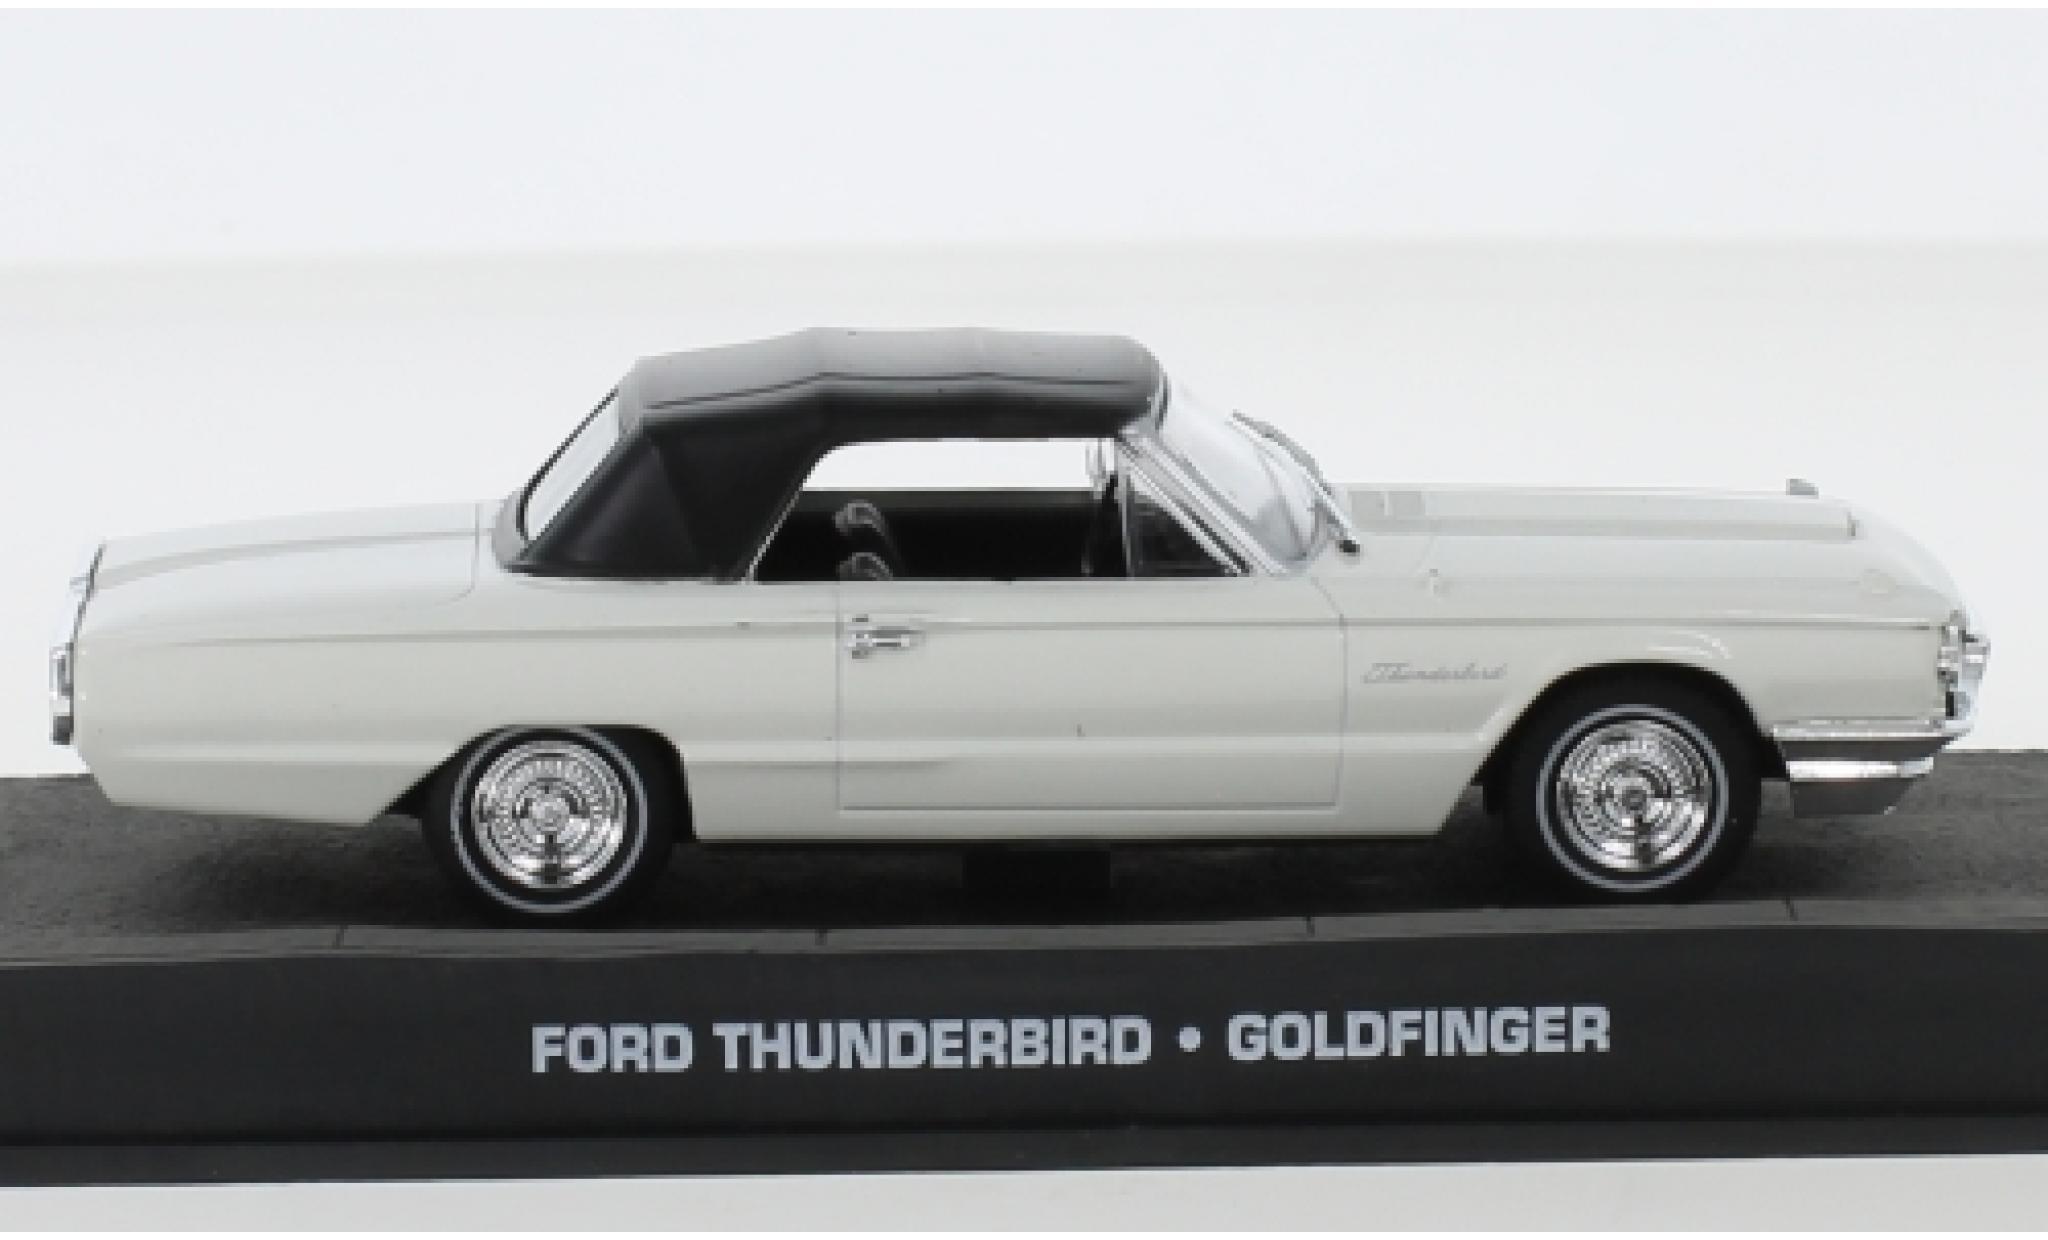 Ford Thunderbird 1/43 SpecialC 007 blanche James Bond 007 1964 Goldfinger sans figurines